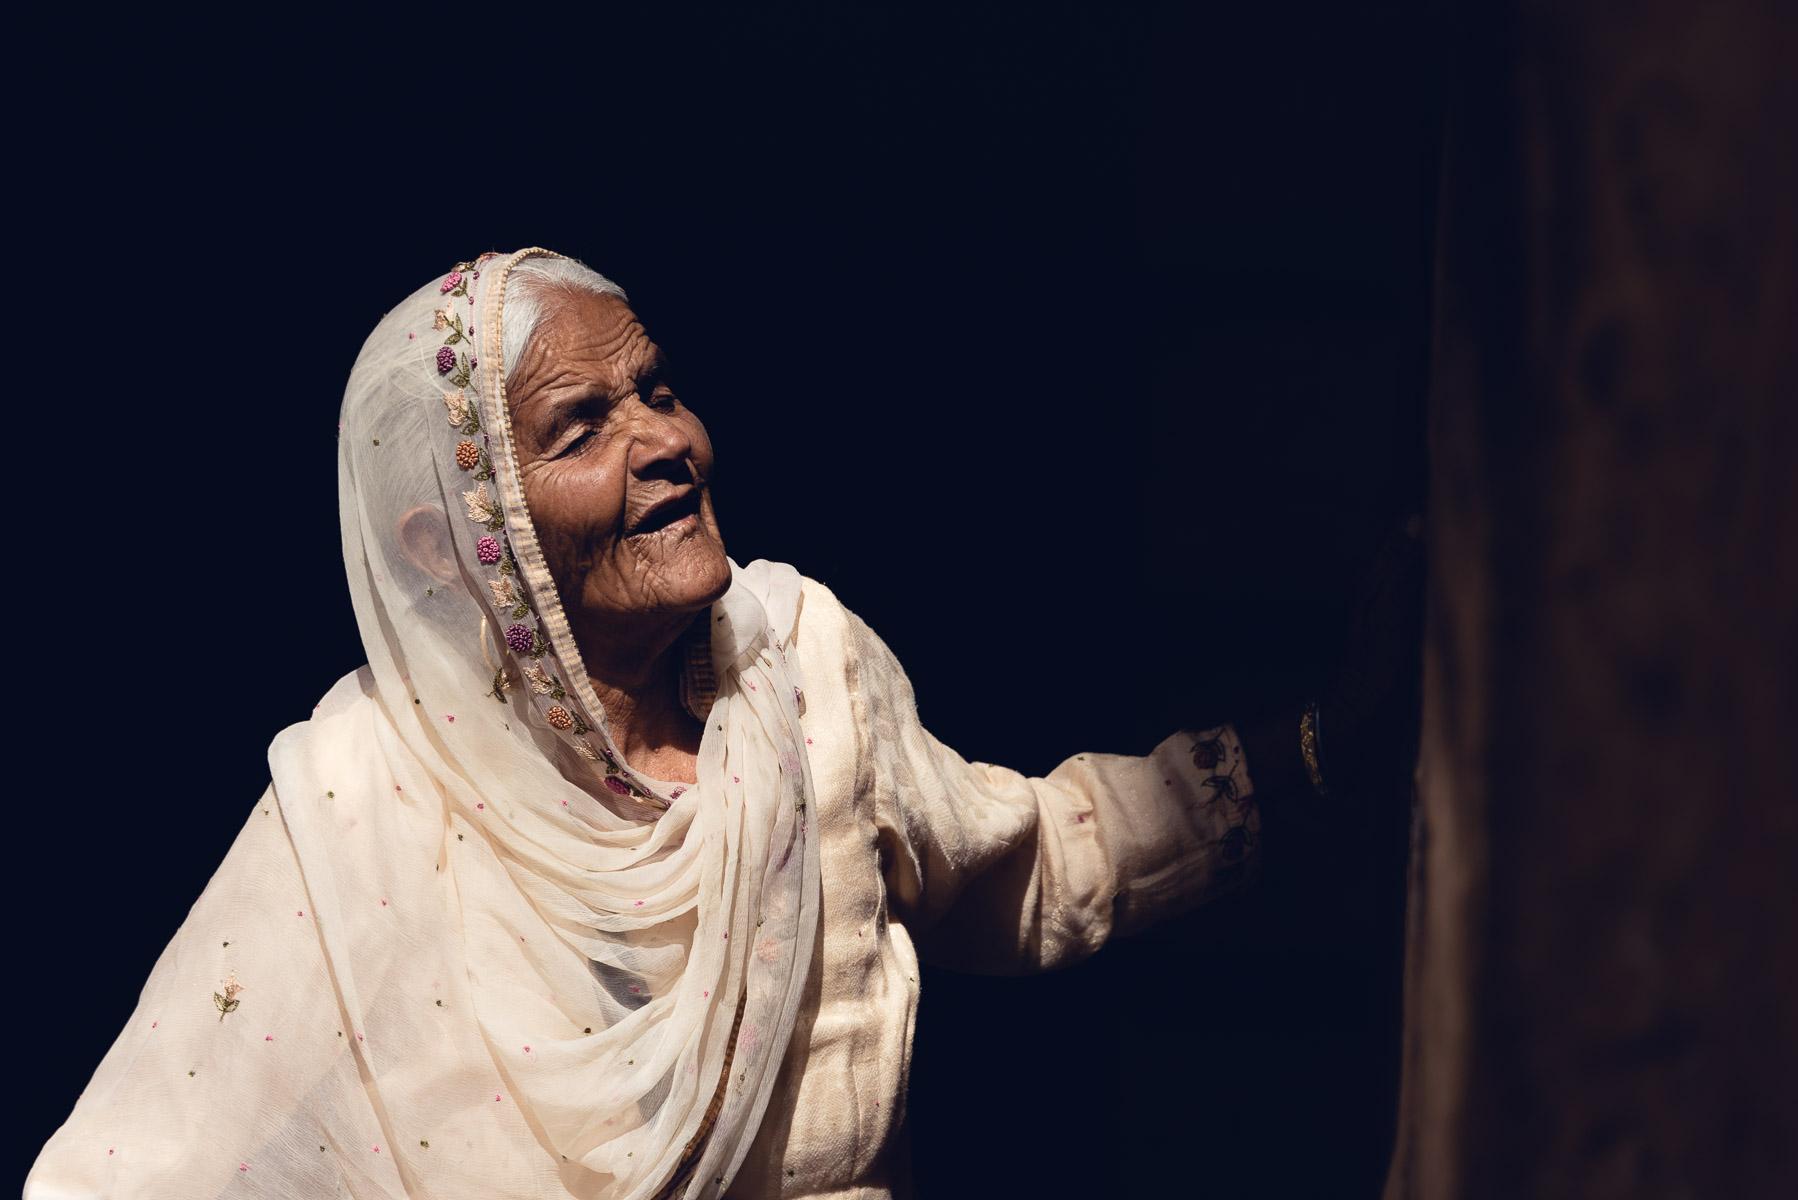 Christian Meixner Fotografie, Fotograf Zürich, Indien, alte Frau